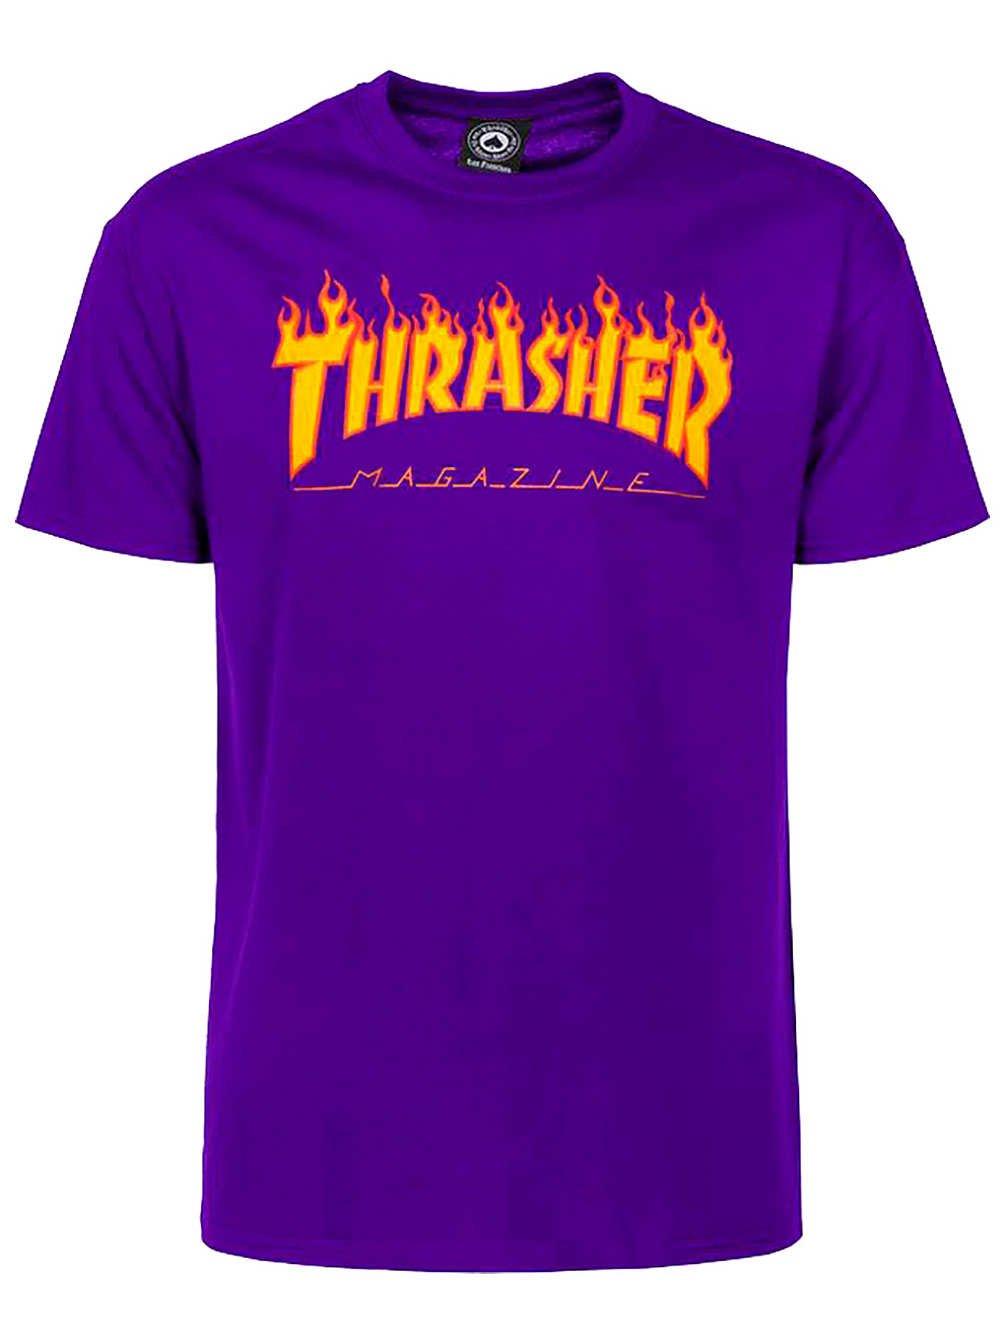 8d709c1df52d THRASHER FLAME SS TSHIRT XL-PURPLE - FLAM-PUR   Shirts   Tees ...